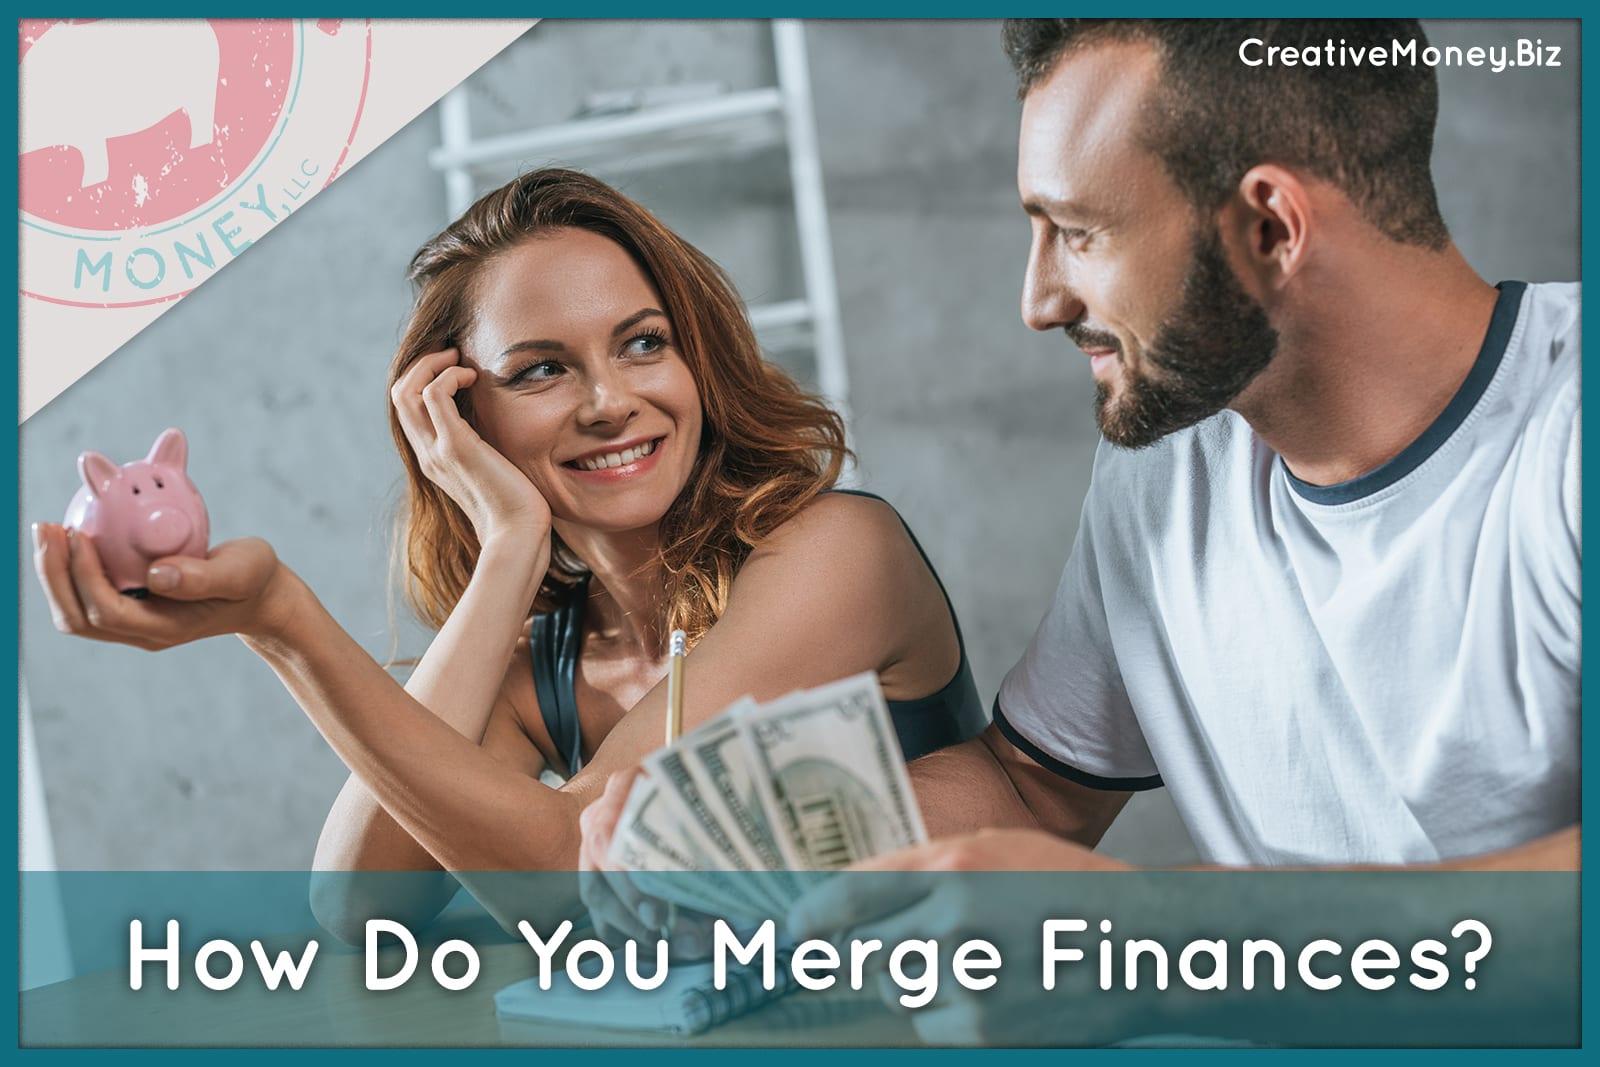 Merge finances